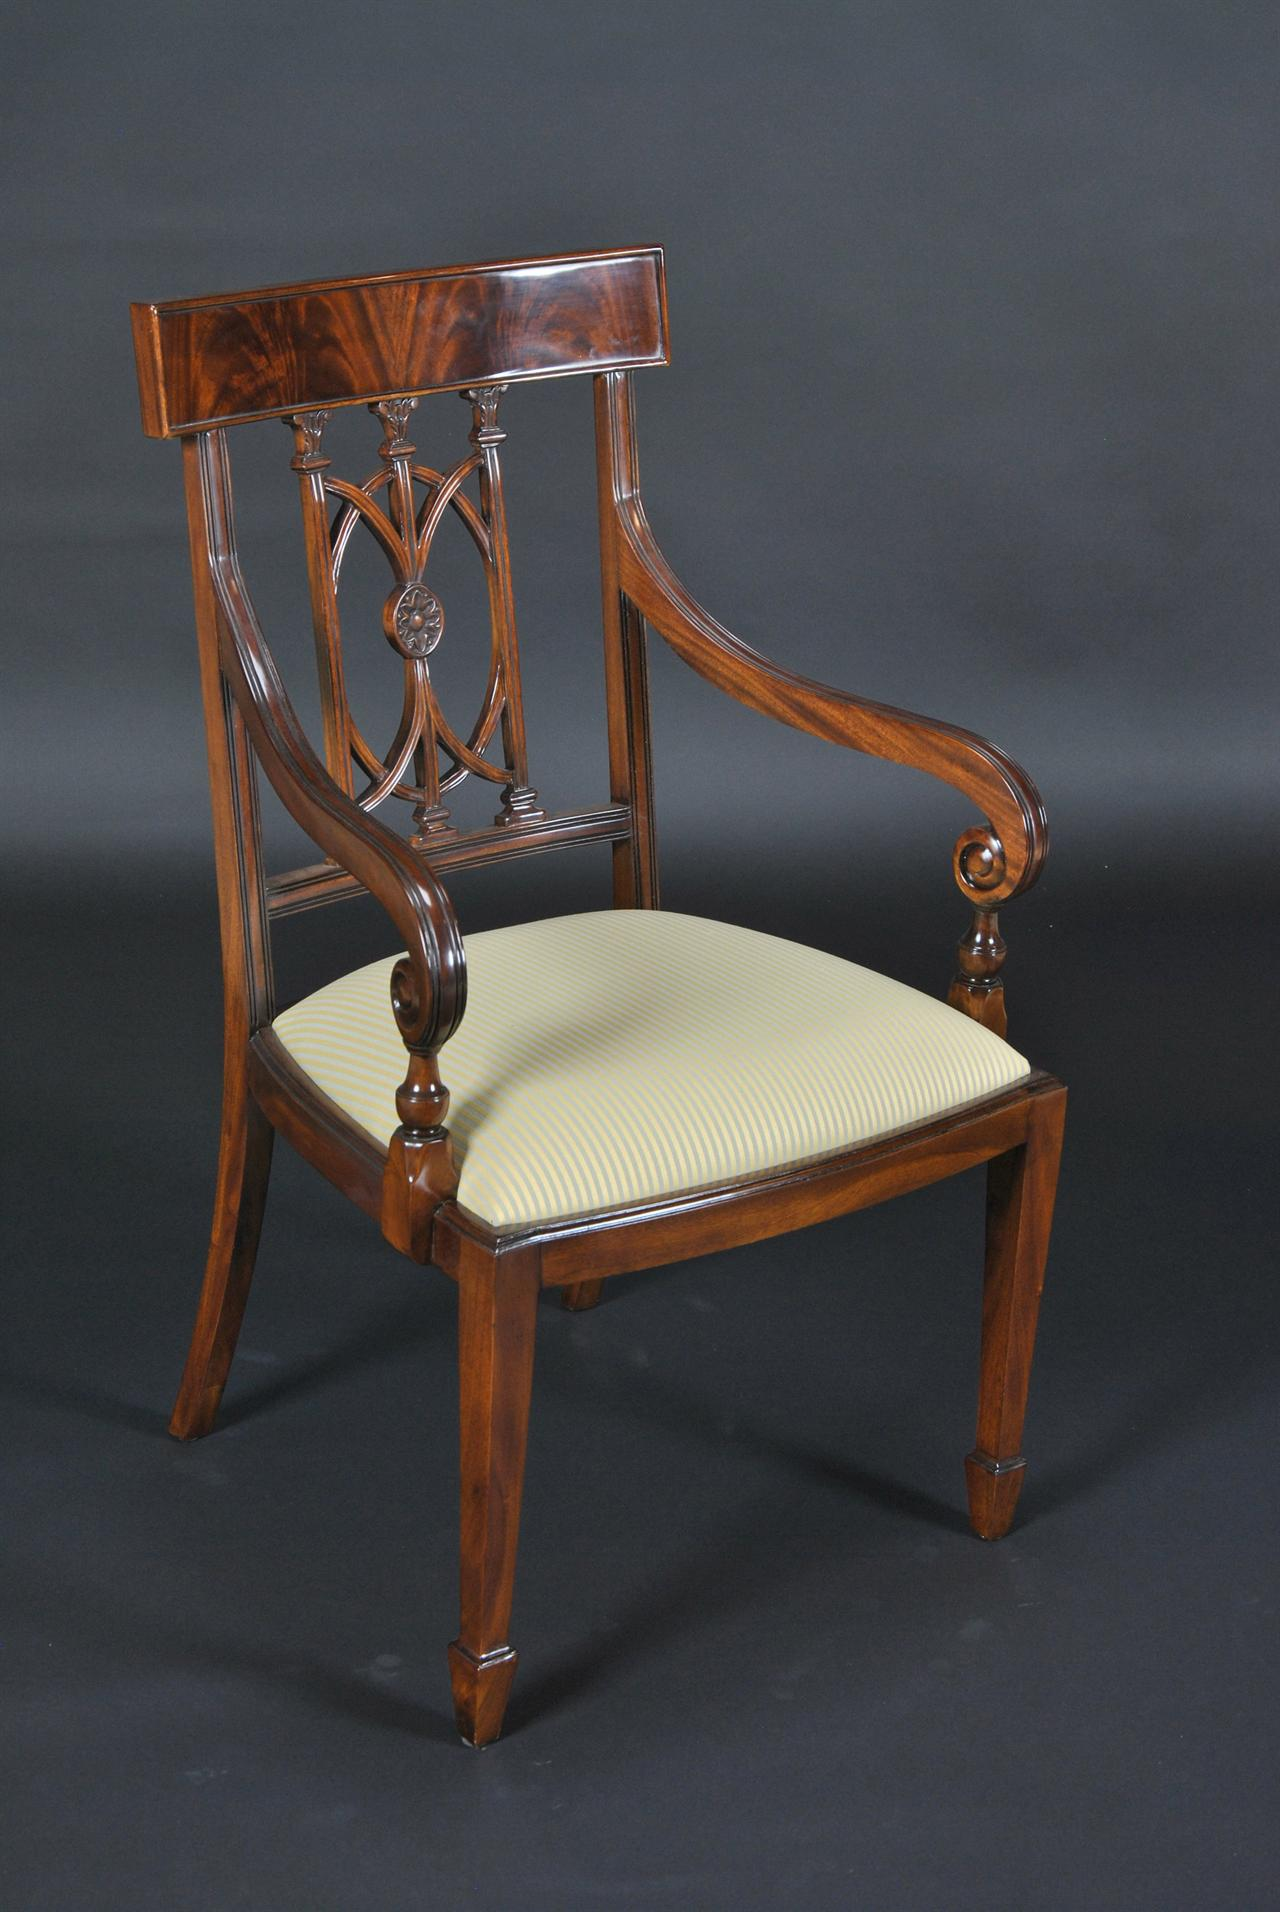 Hepplewhite Style Dining Chairs With Swirl Mahogany Crest